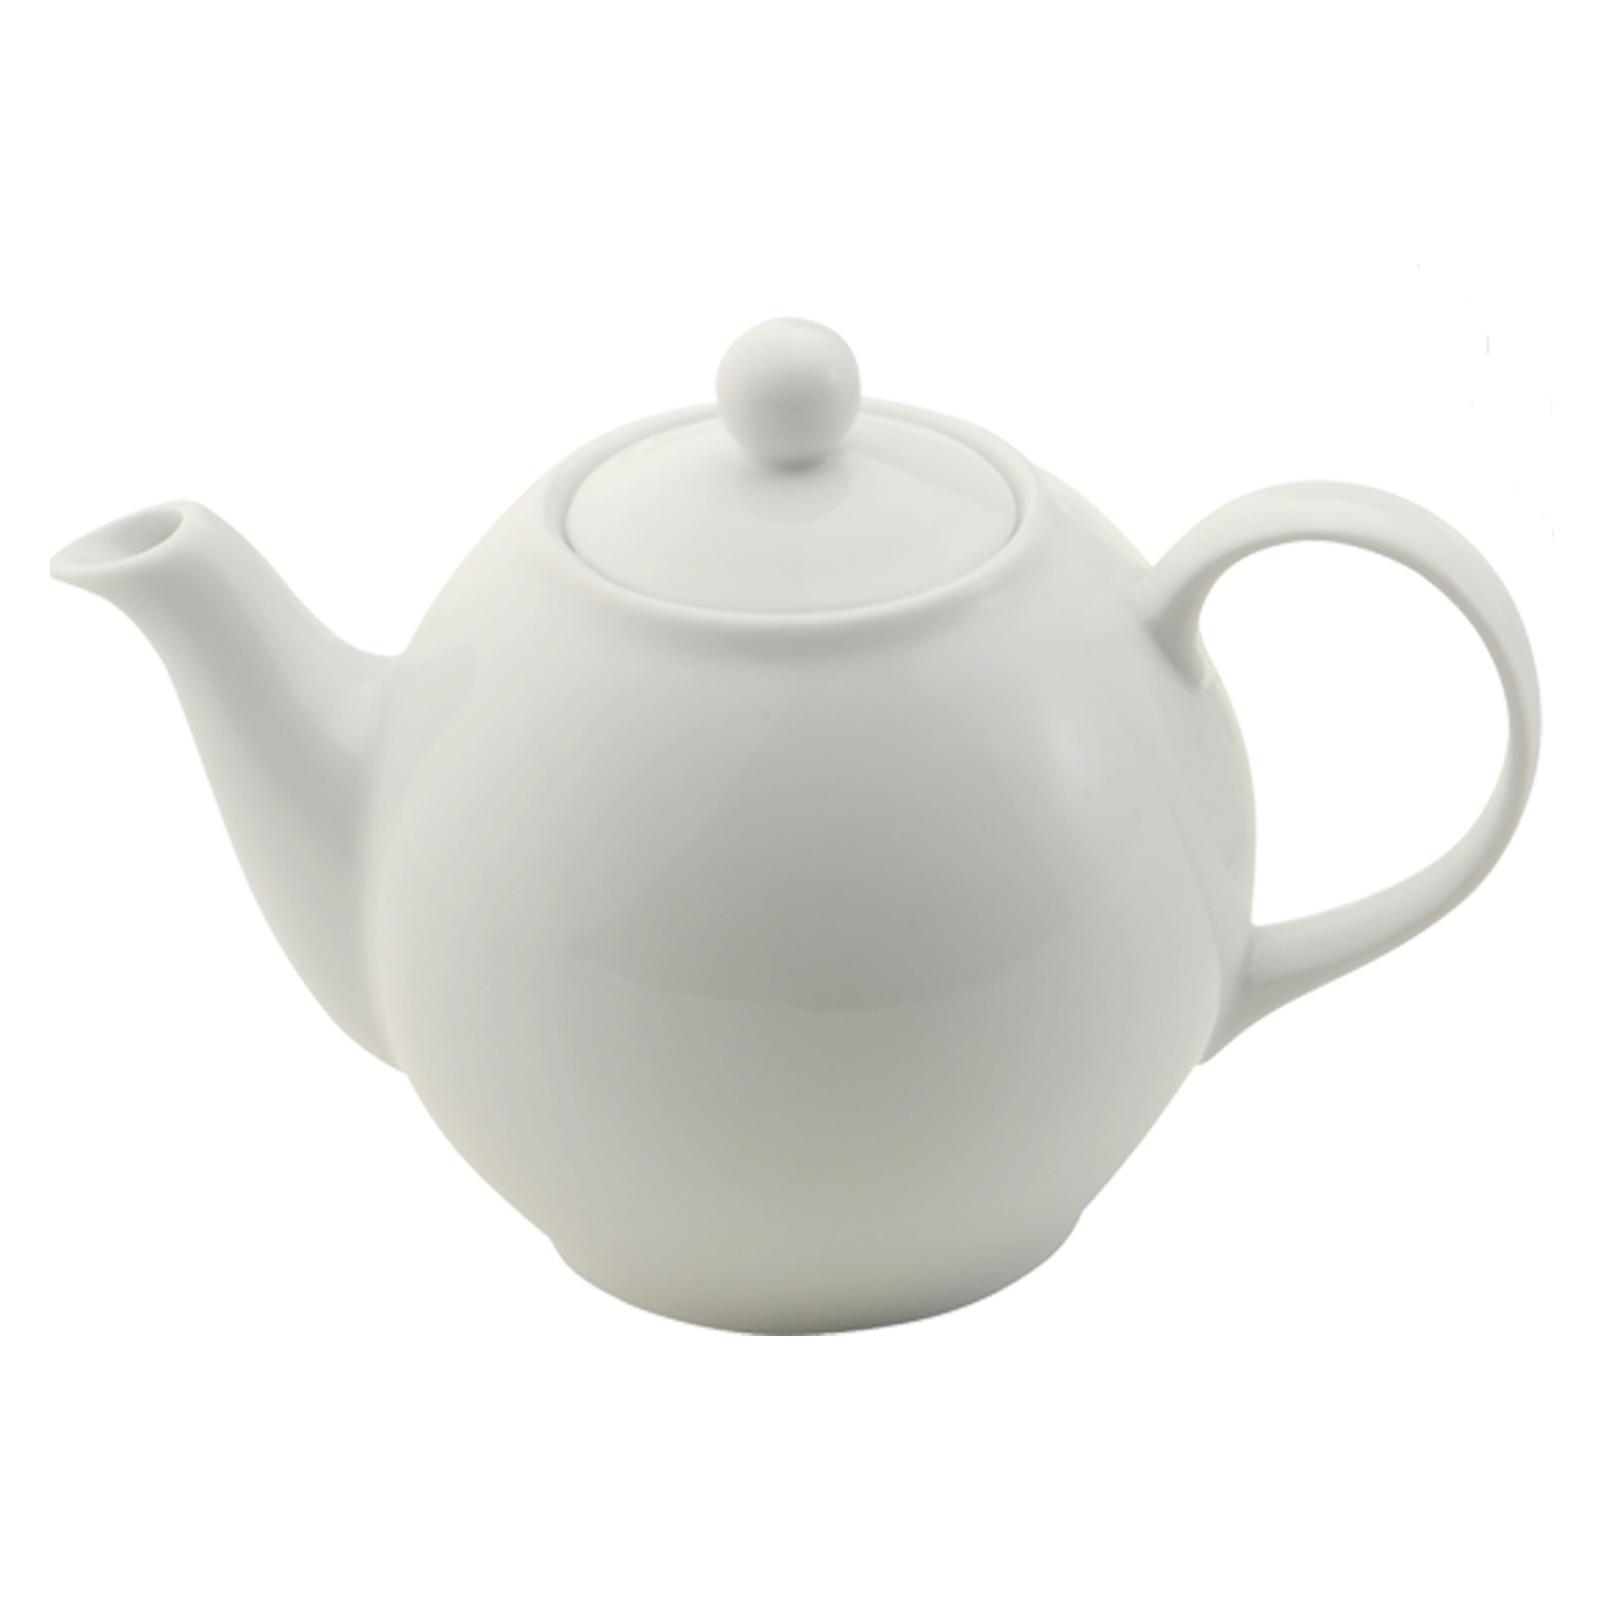 Orbit Teapot Large by BIA